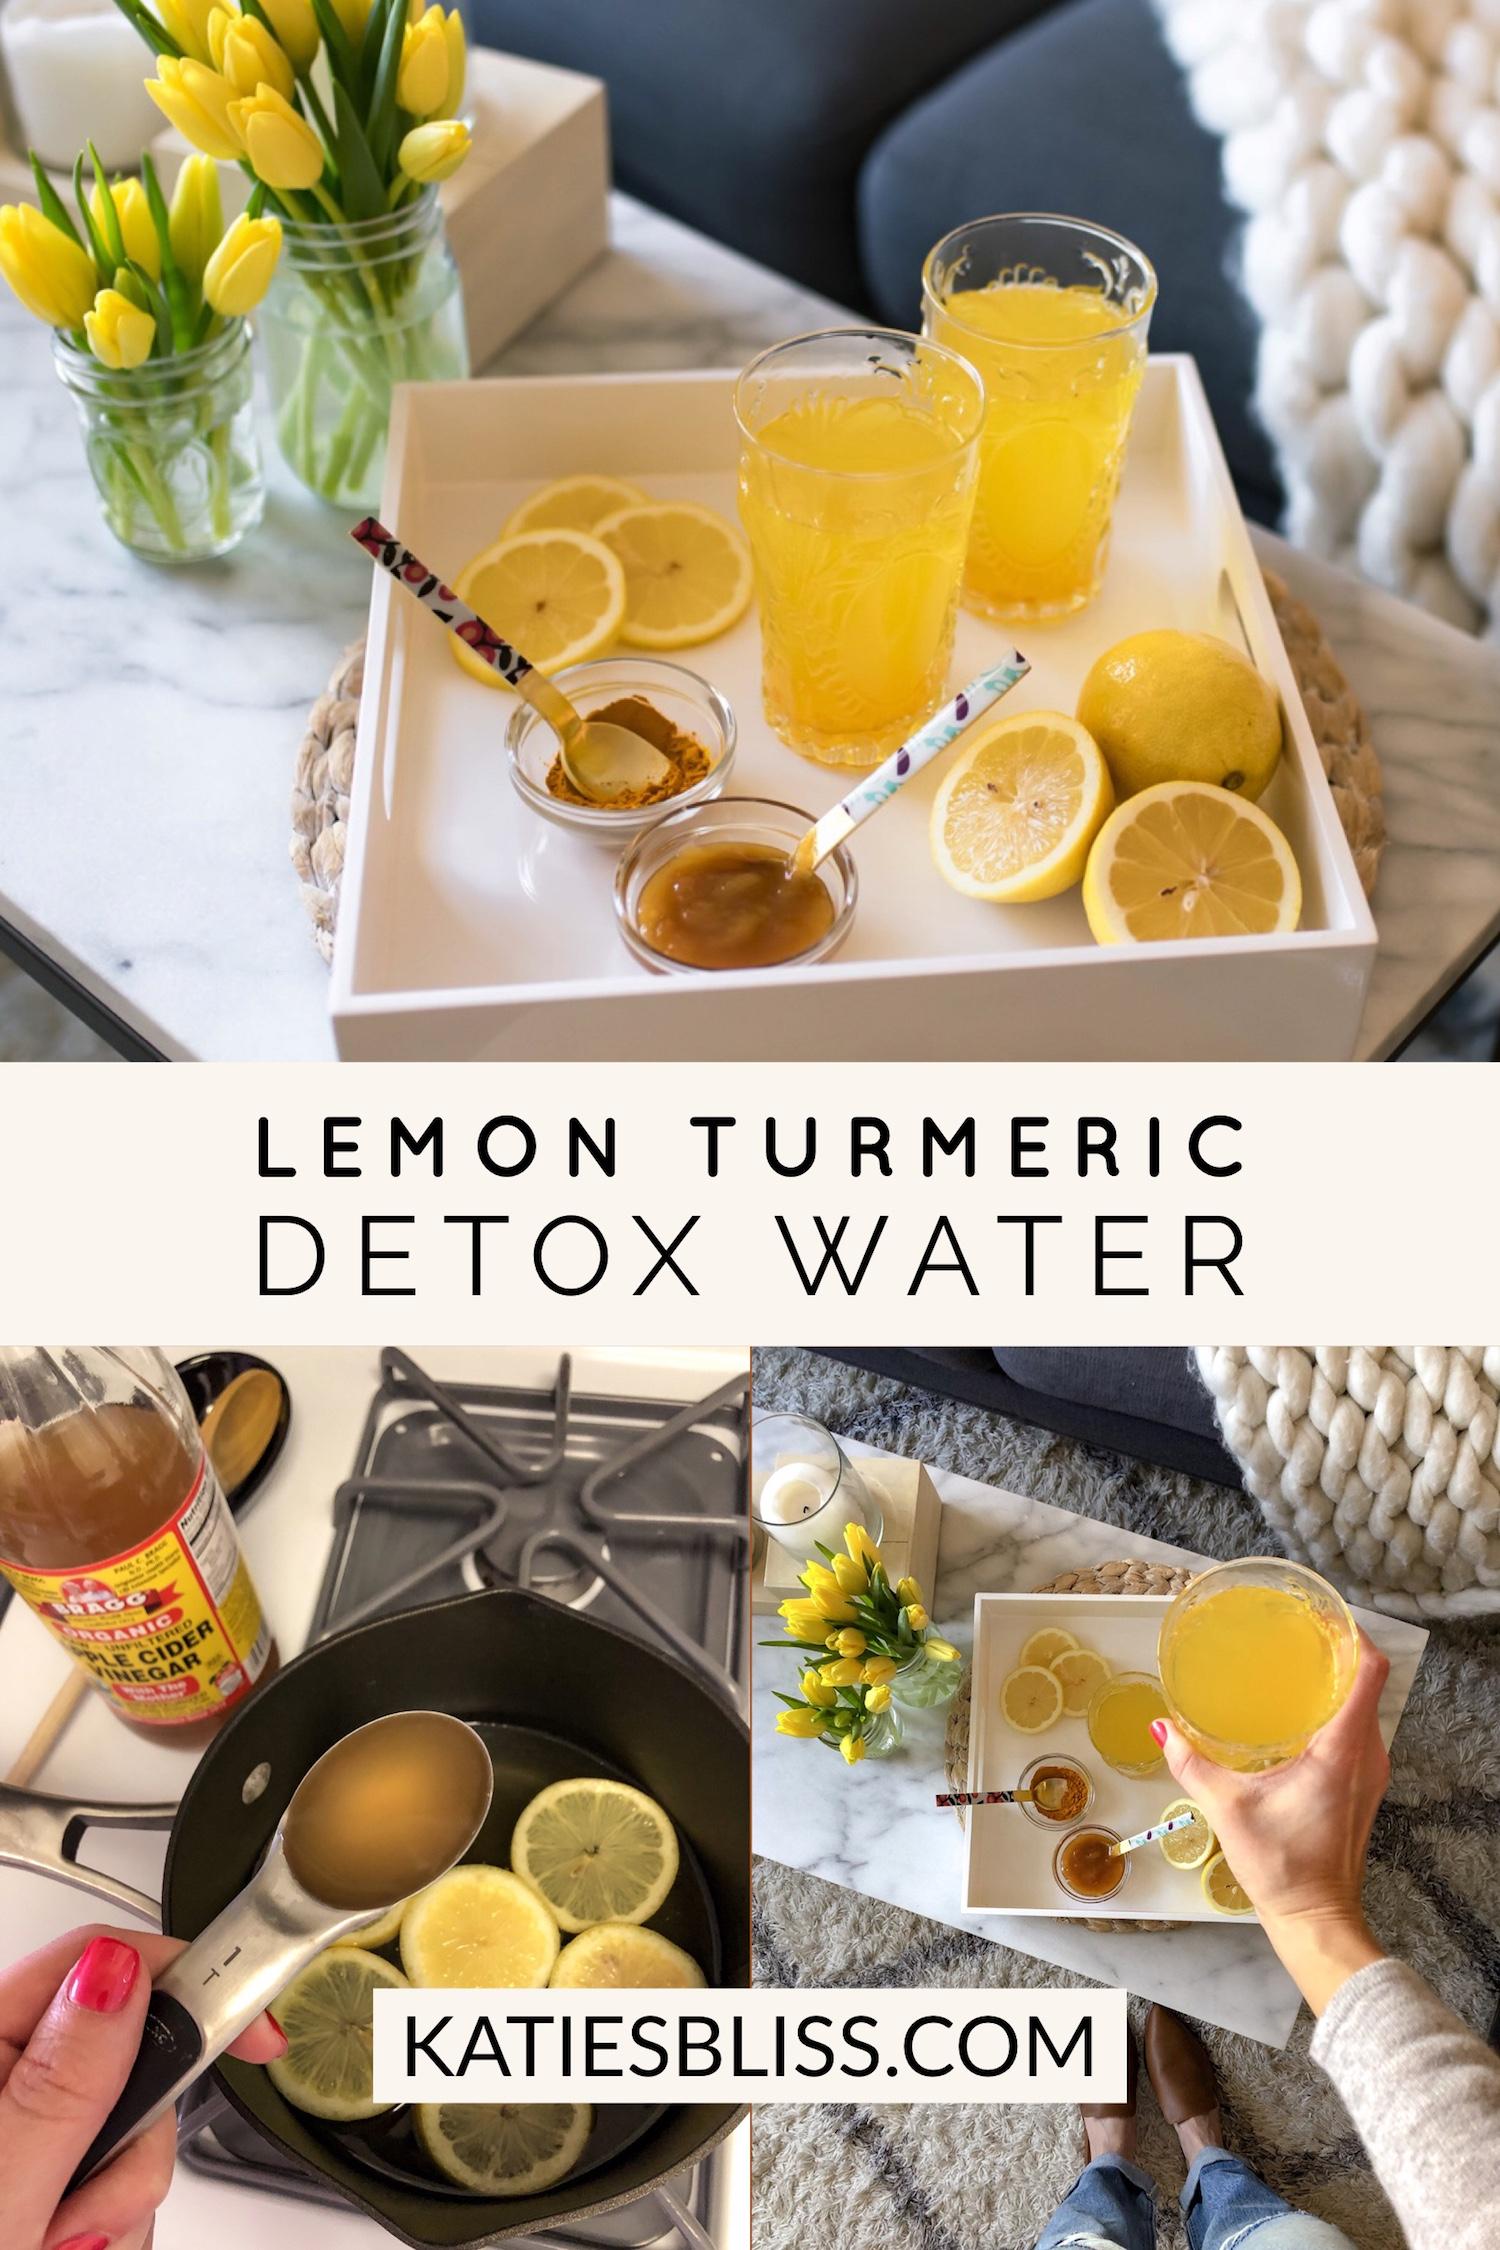 Lemon Turmeric Morning Detox Water Recipe | Katie's Bliss